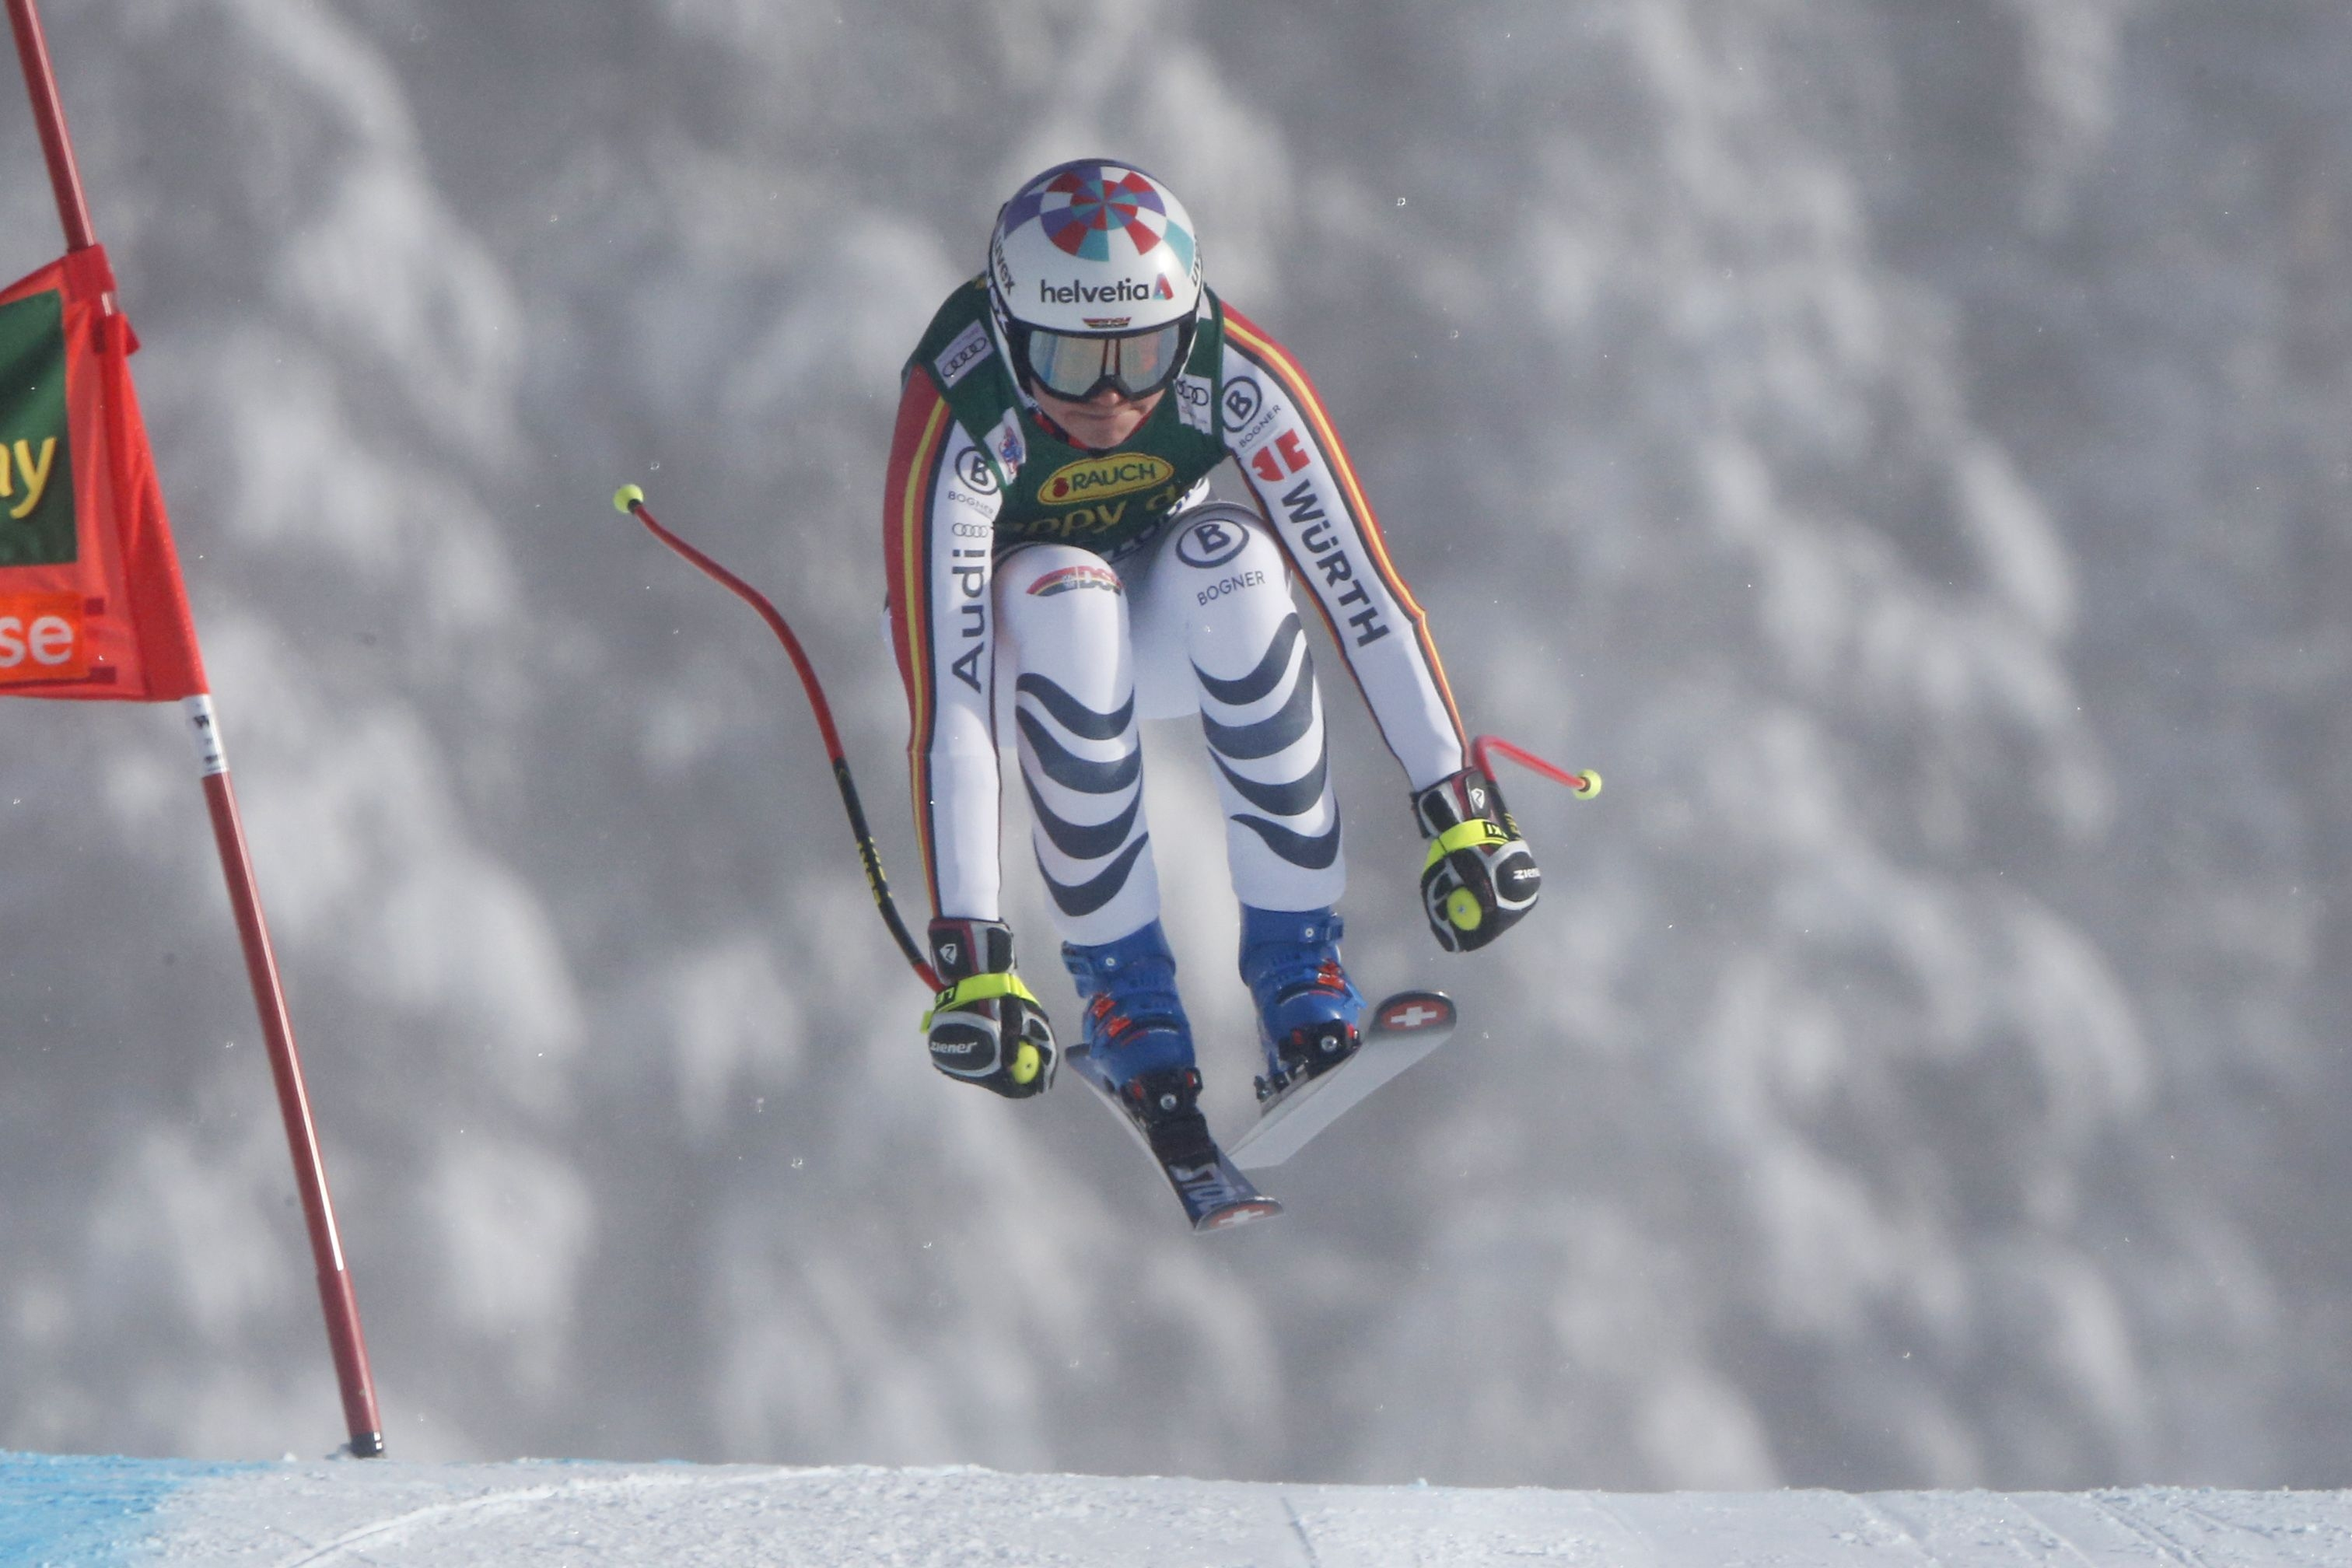 Виктория Ребенсбург спечели безапелационно първия за сезона супергигантски слалом при